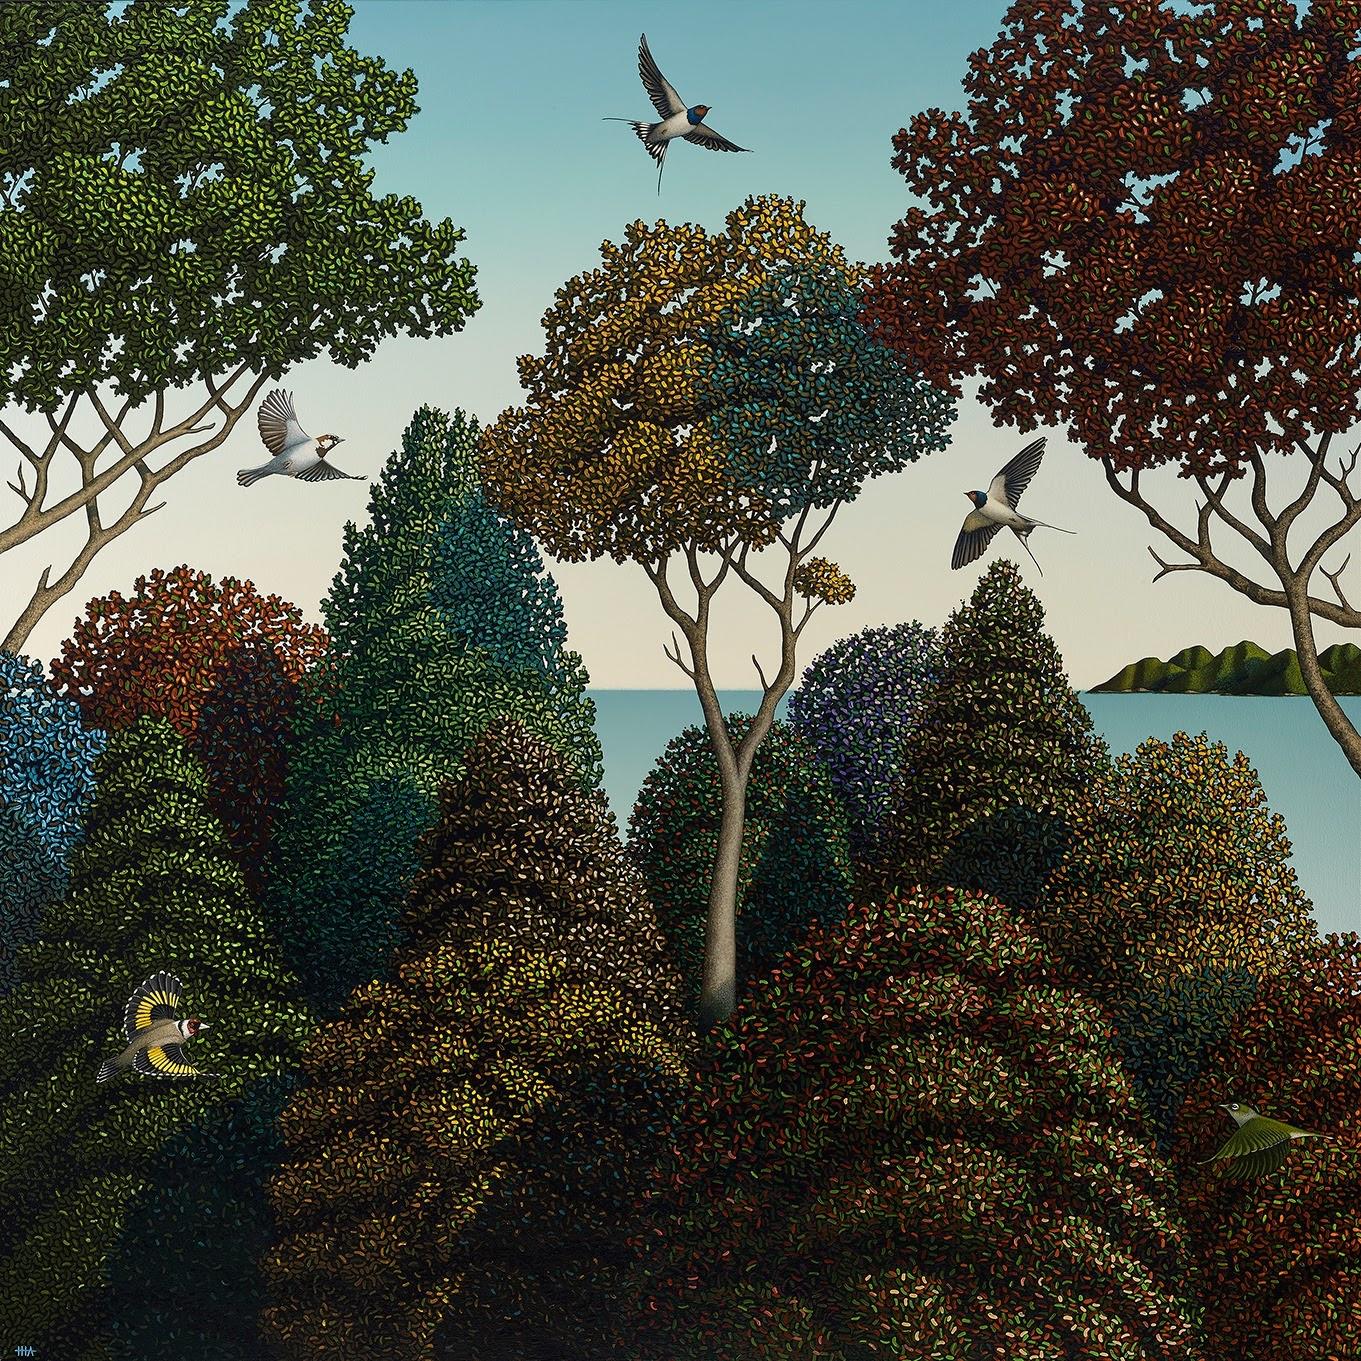 Hamish Allan Spring and the pleasure garden